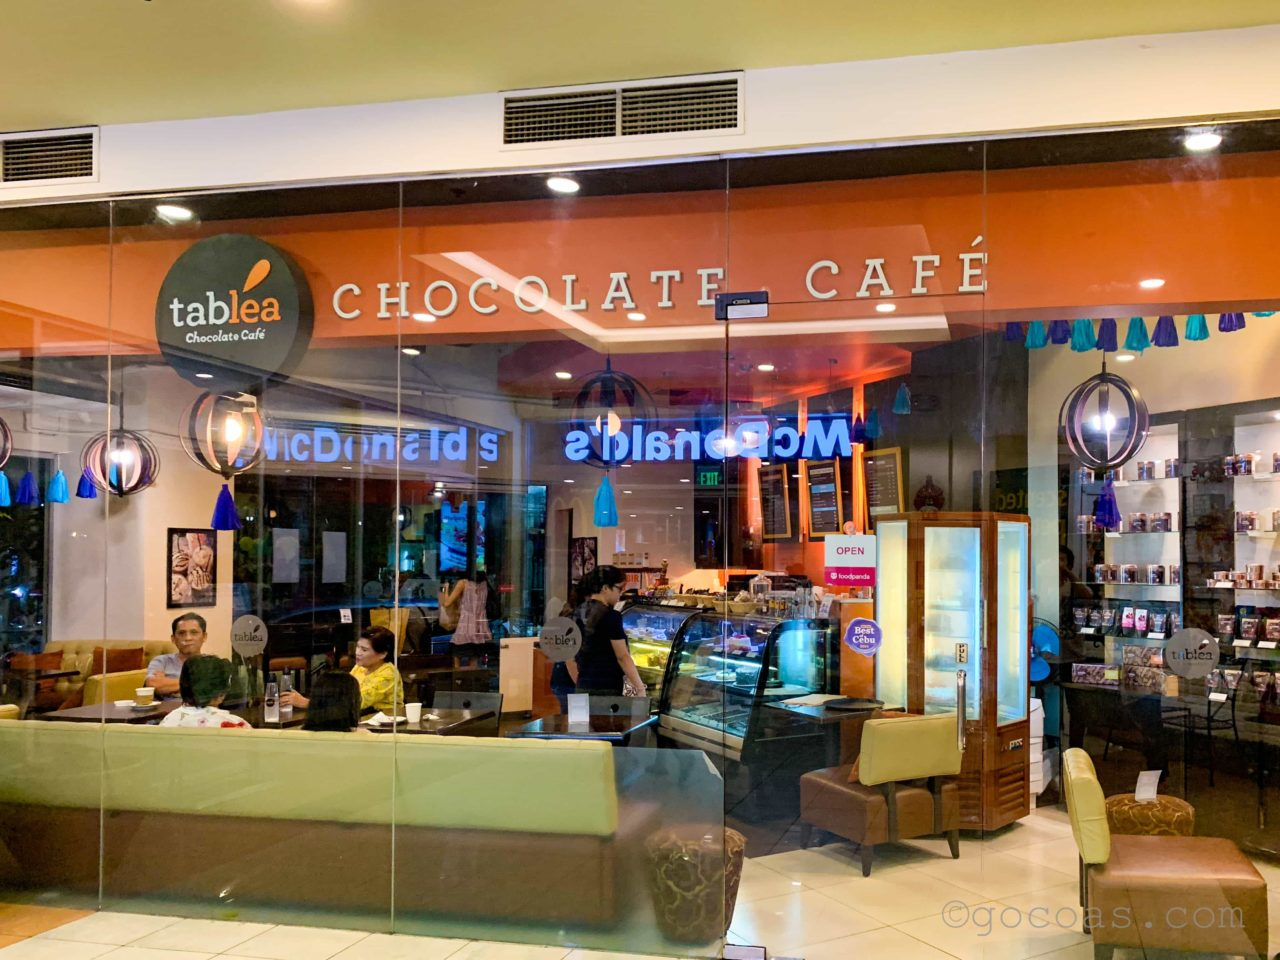 CHOCOLATE CAFE tablea 外観